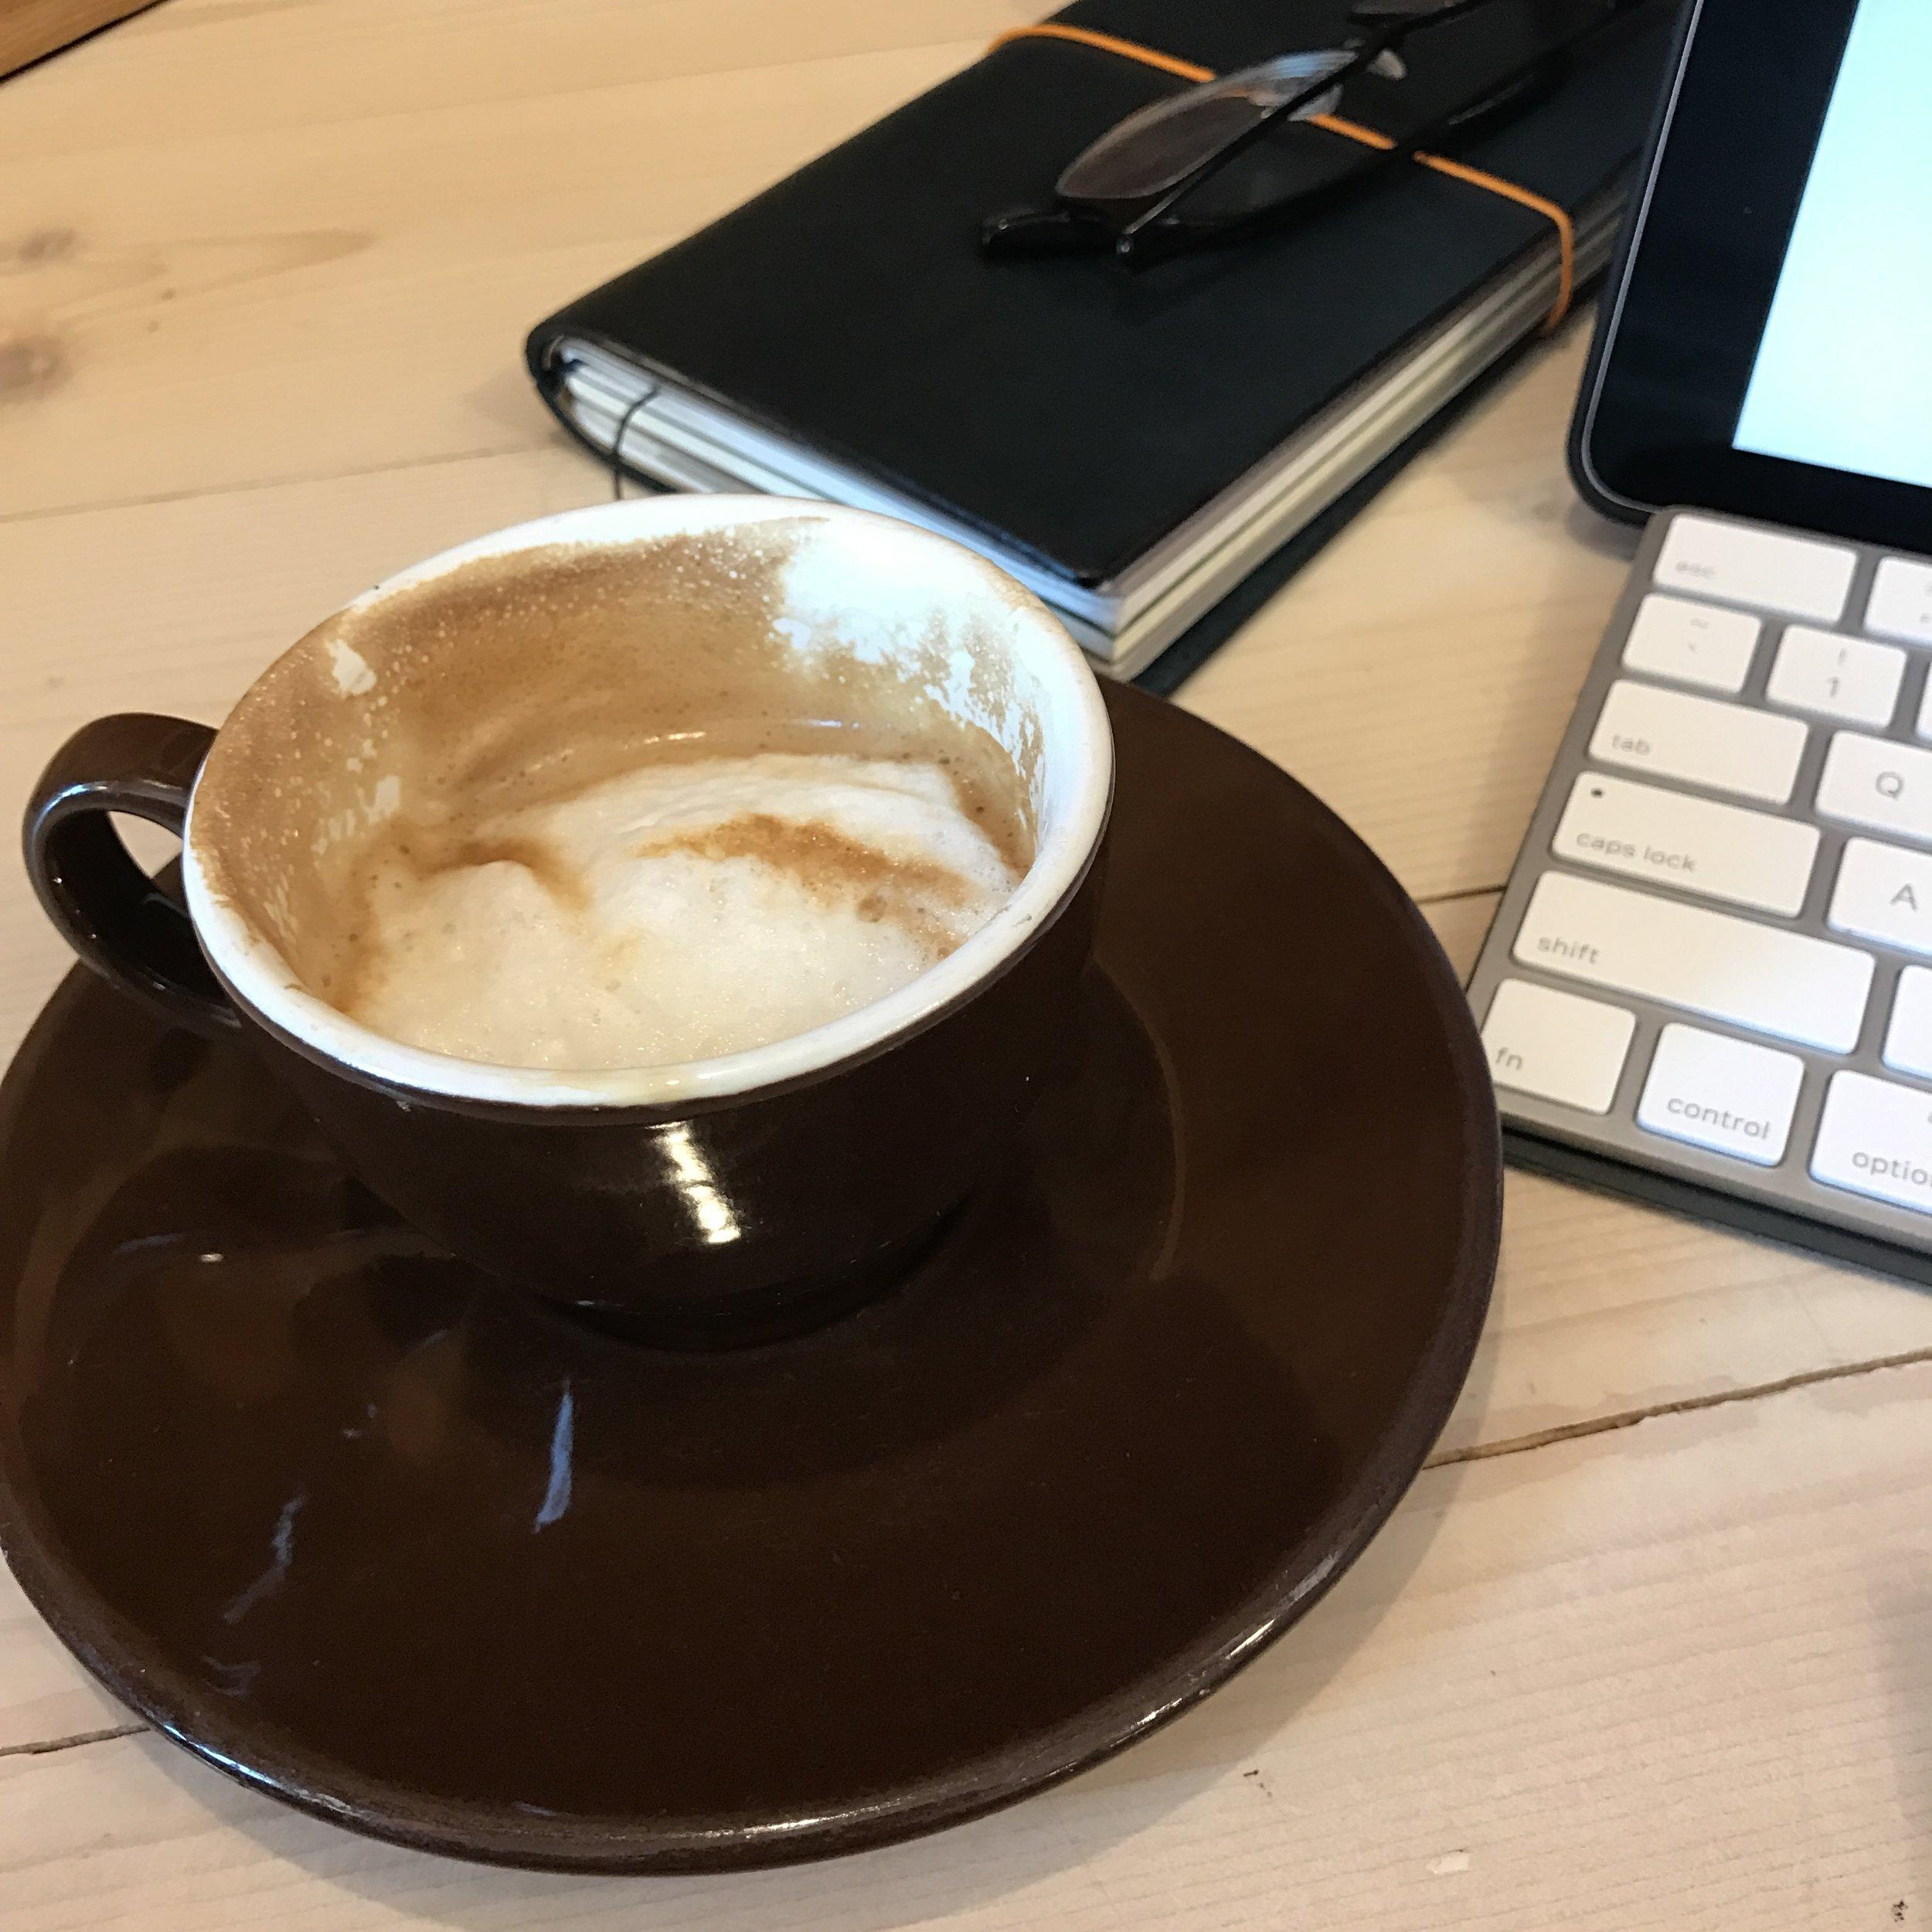 Sunday-Reading-Coffee-iPad